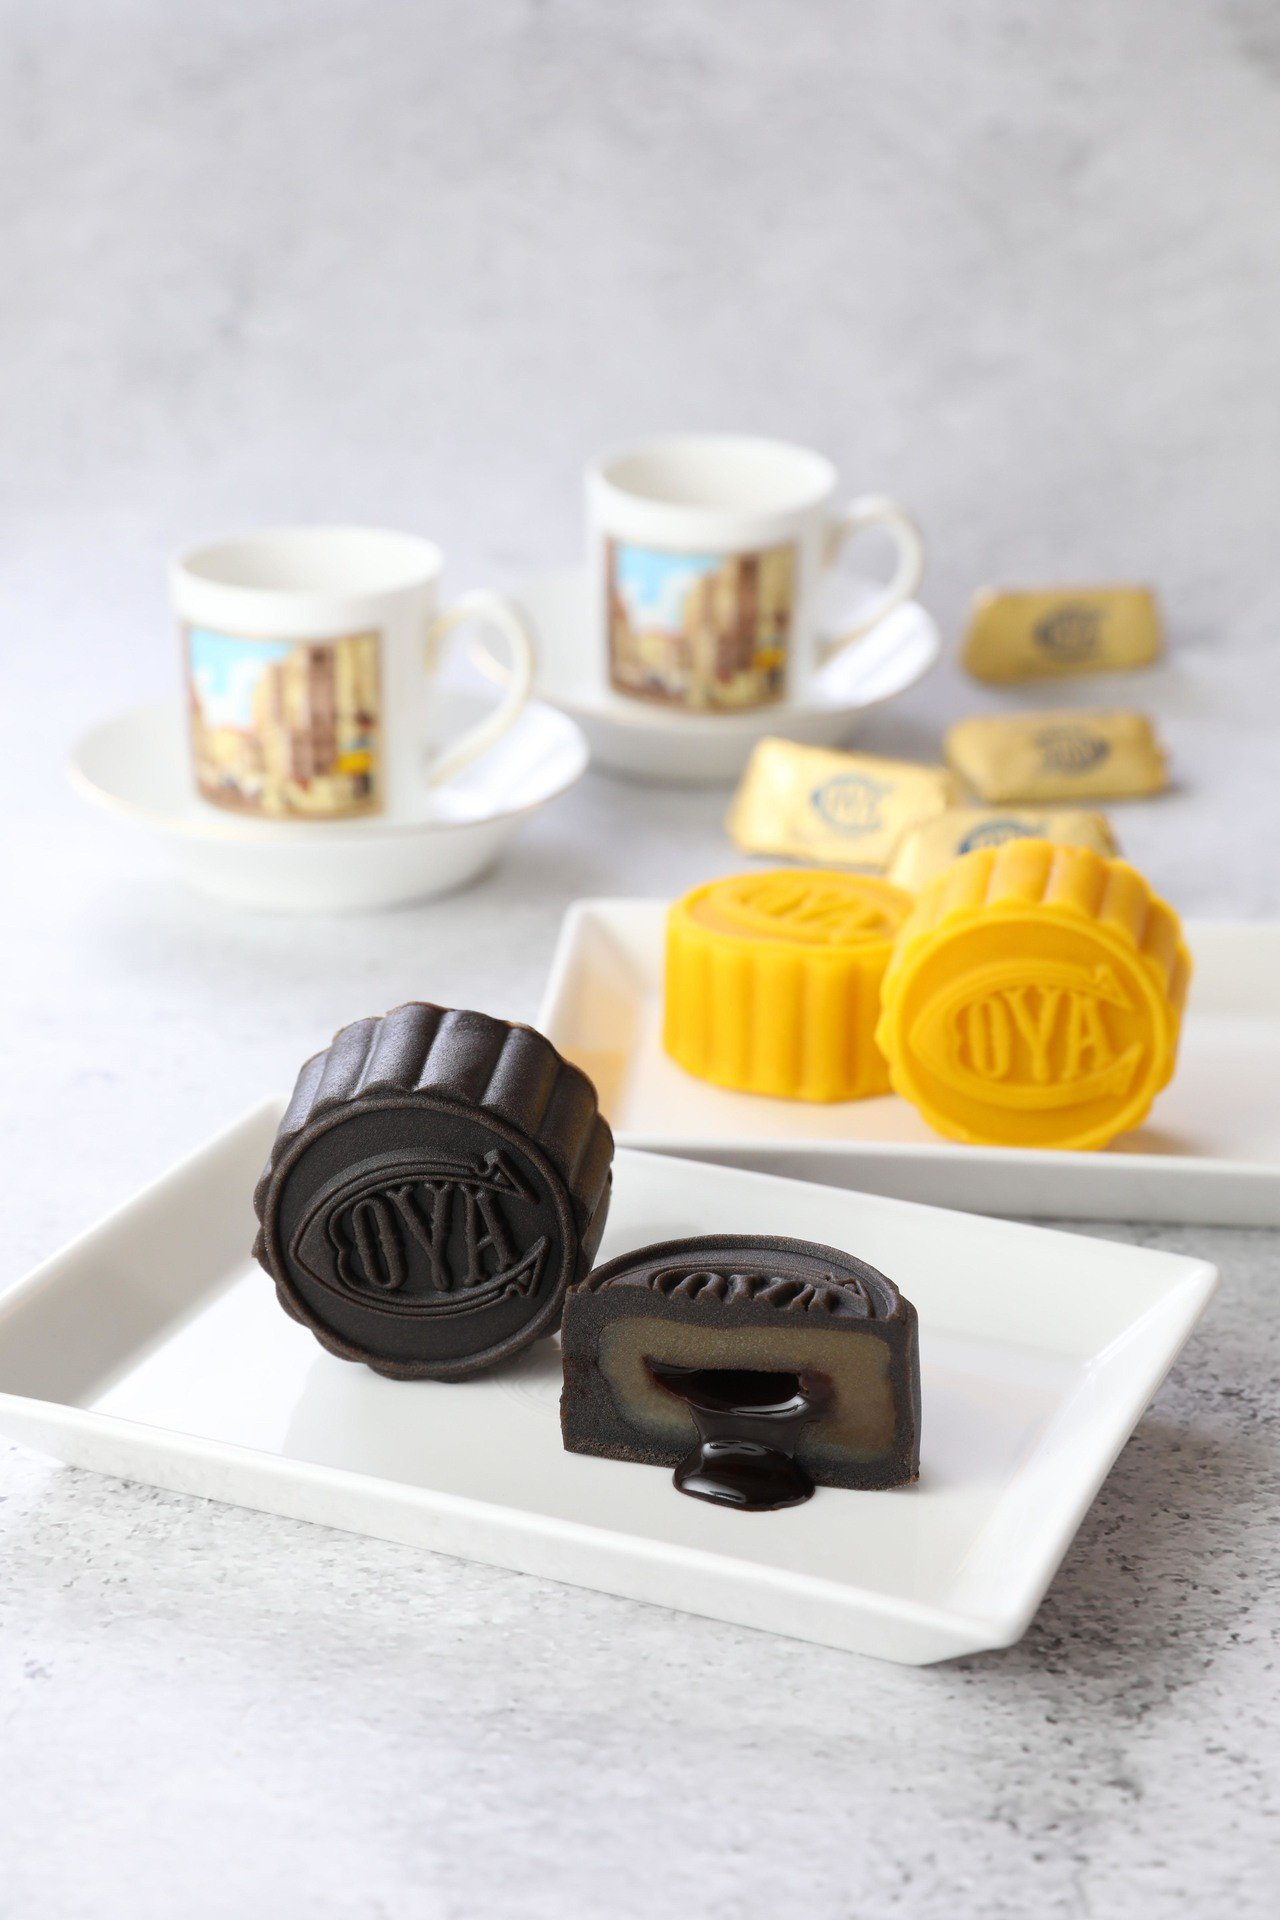 COVA中秋禮盒含太妃巧克力流芯月餅(前)、香橙巧克力流芯月餅(後)。圖/COV...